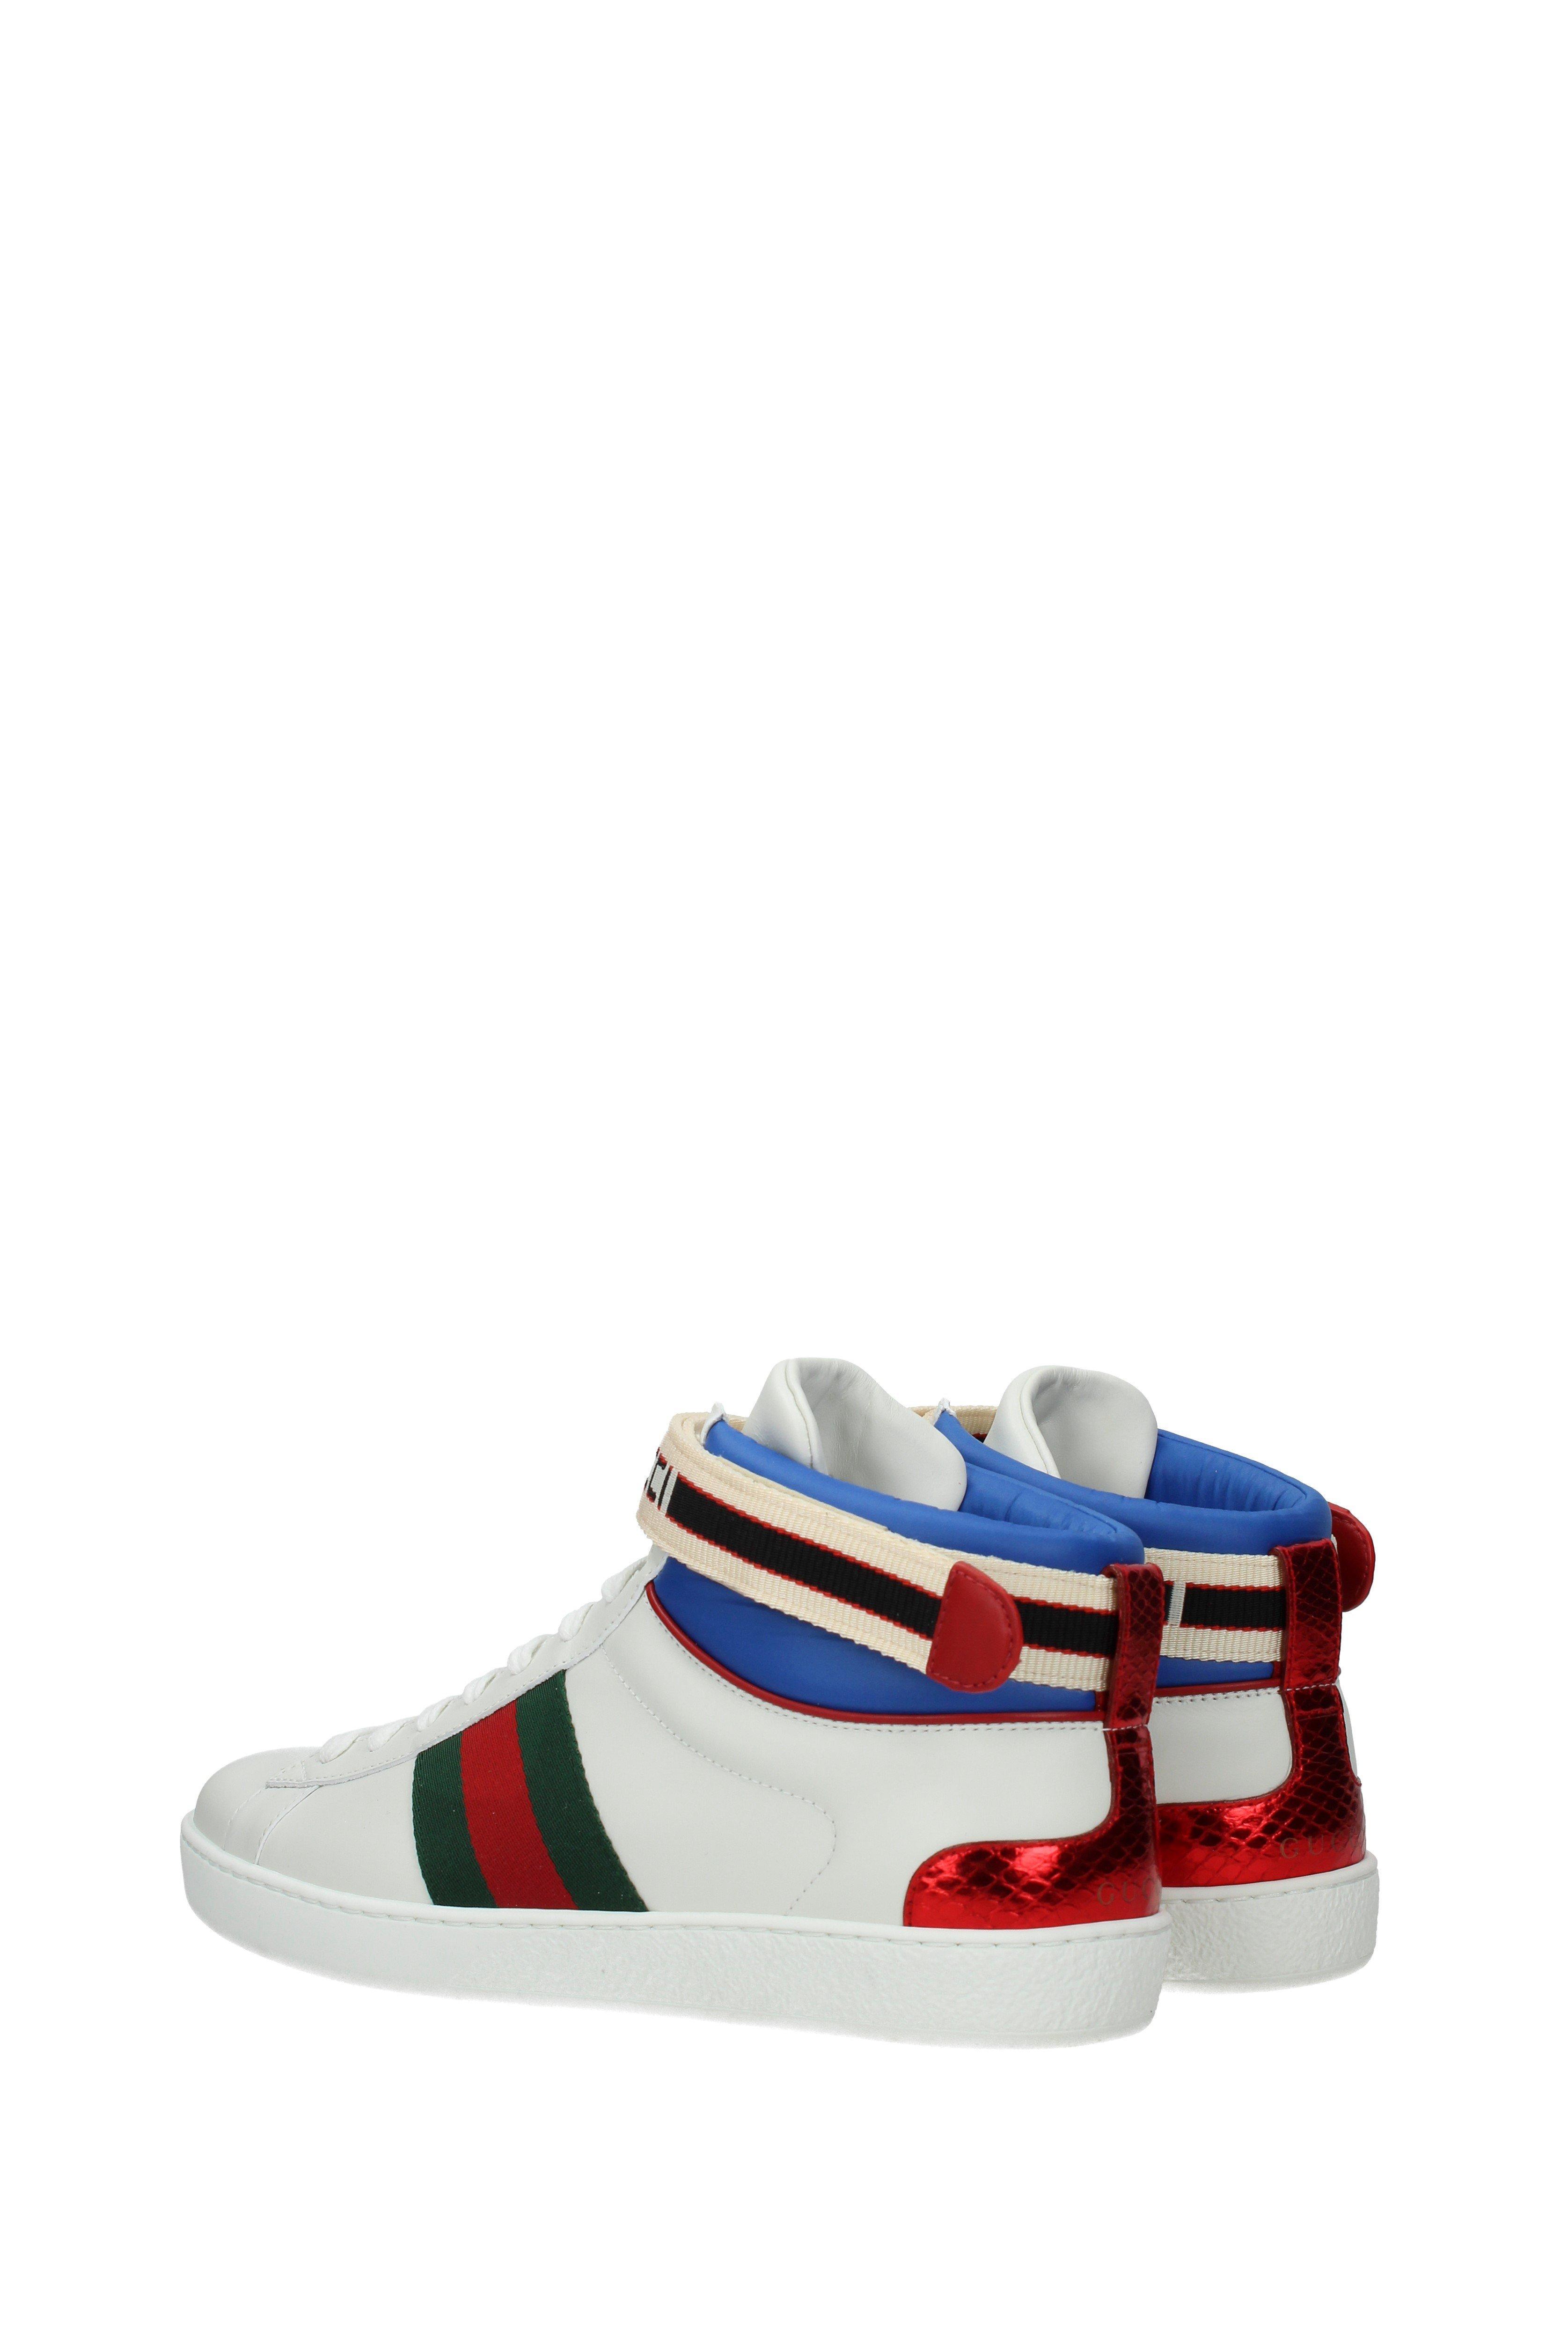 Gucci Sneakers Men White In White For Men Lyst